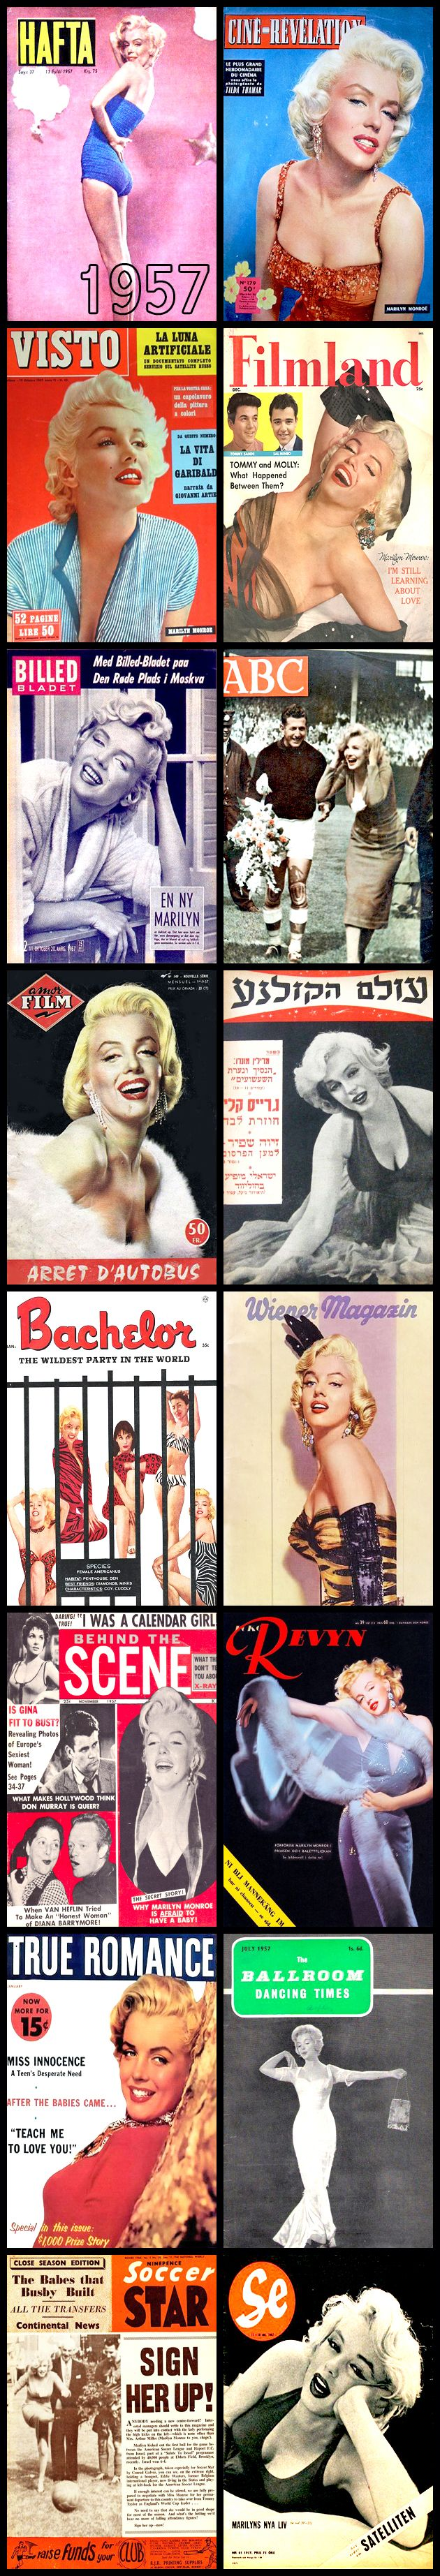 Scaravelli Yoga (With images) Marilyn monroe art